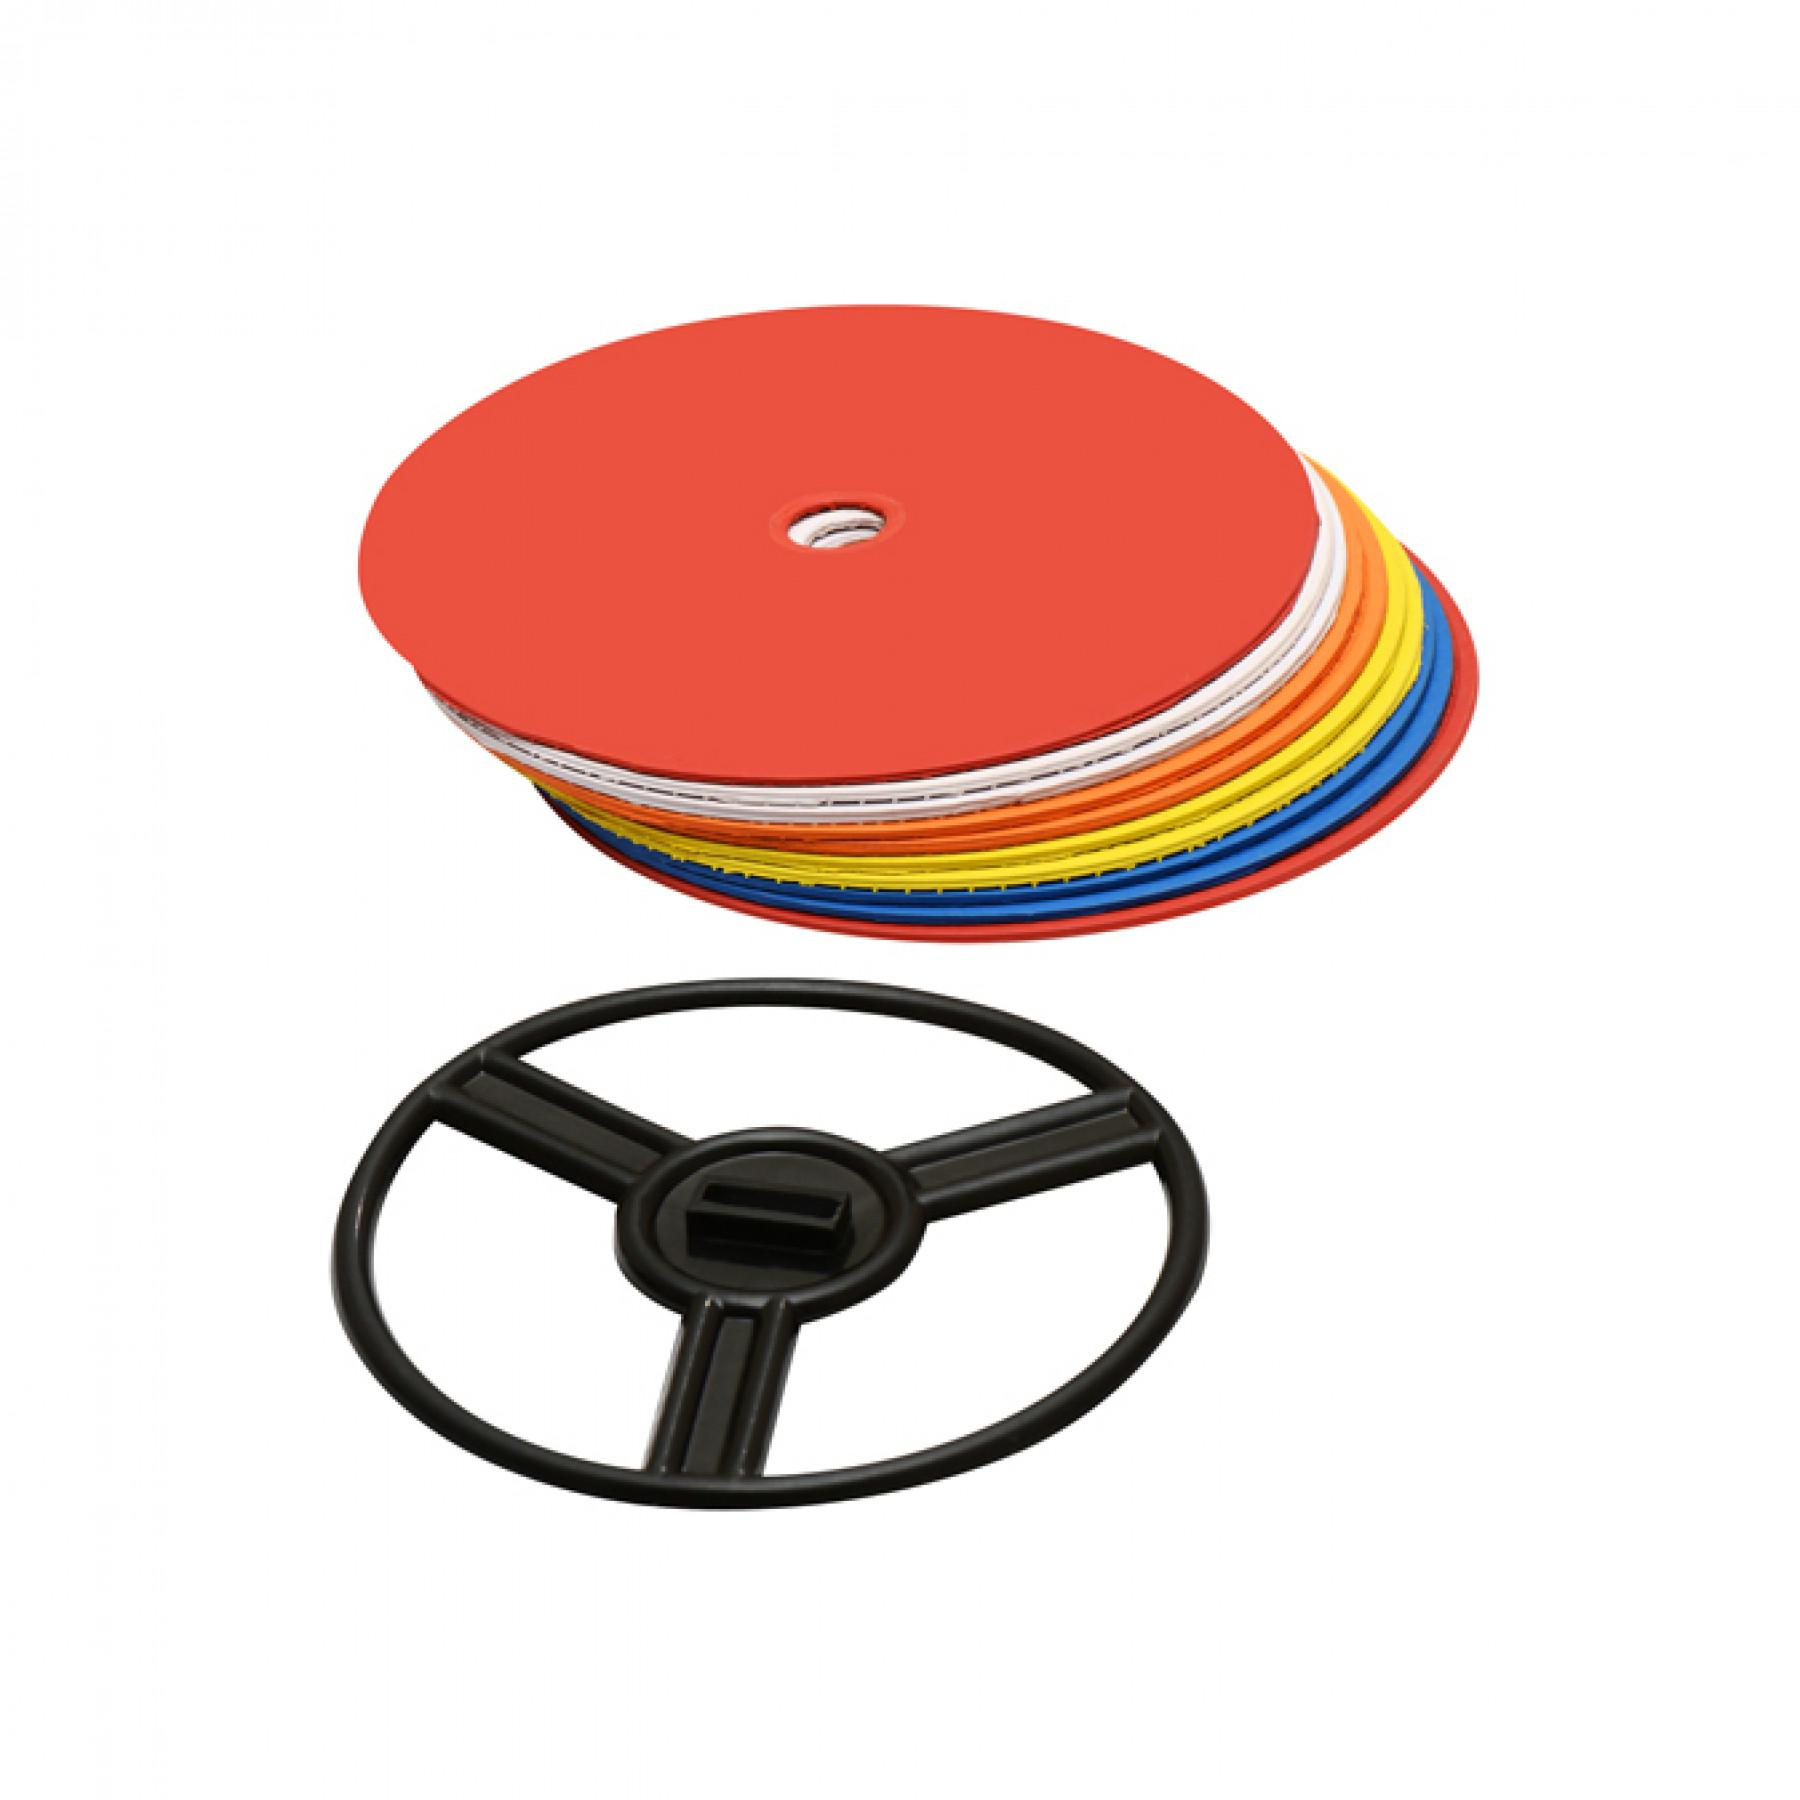 Set 10 marking discs Macron